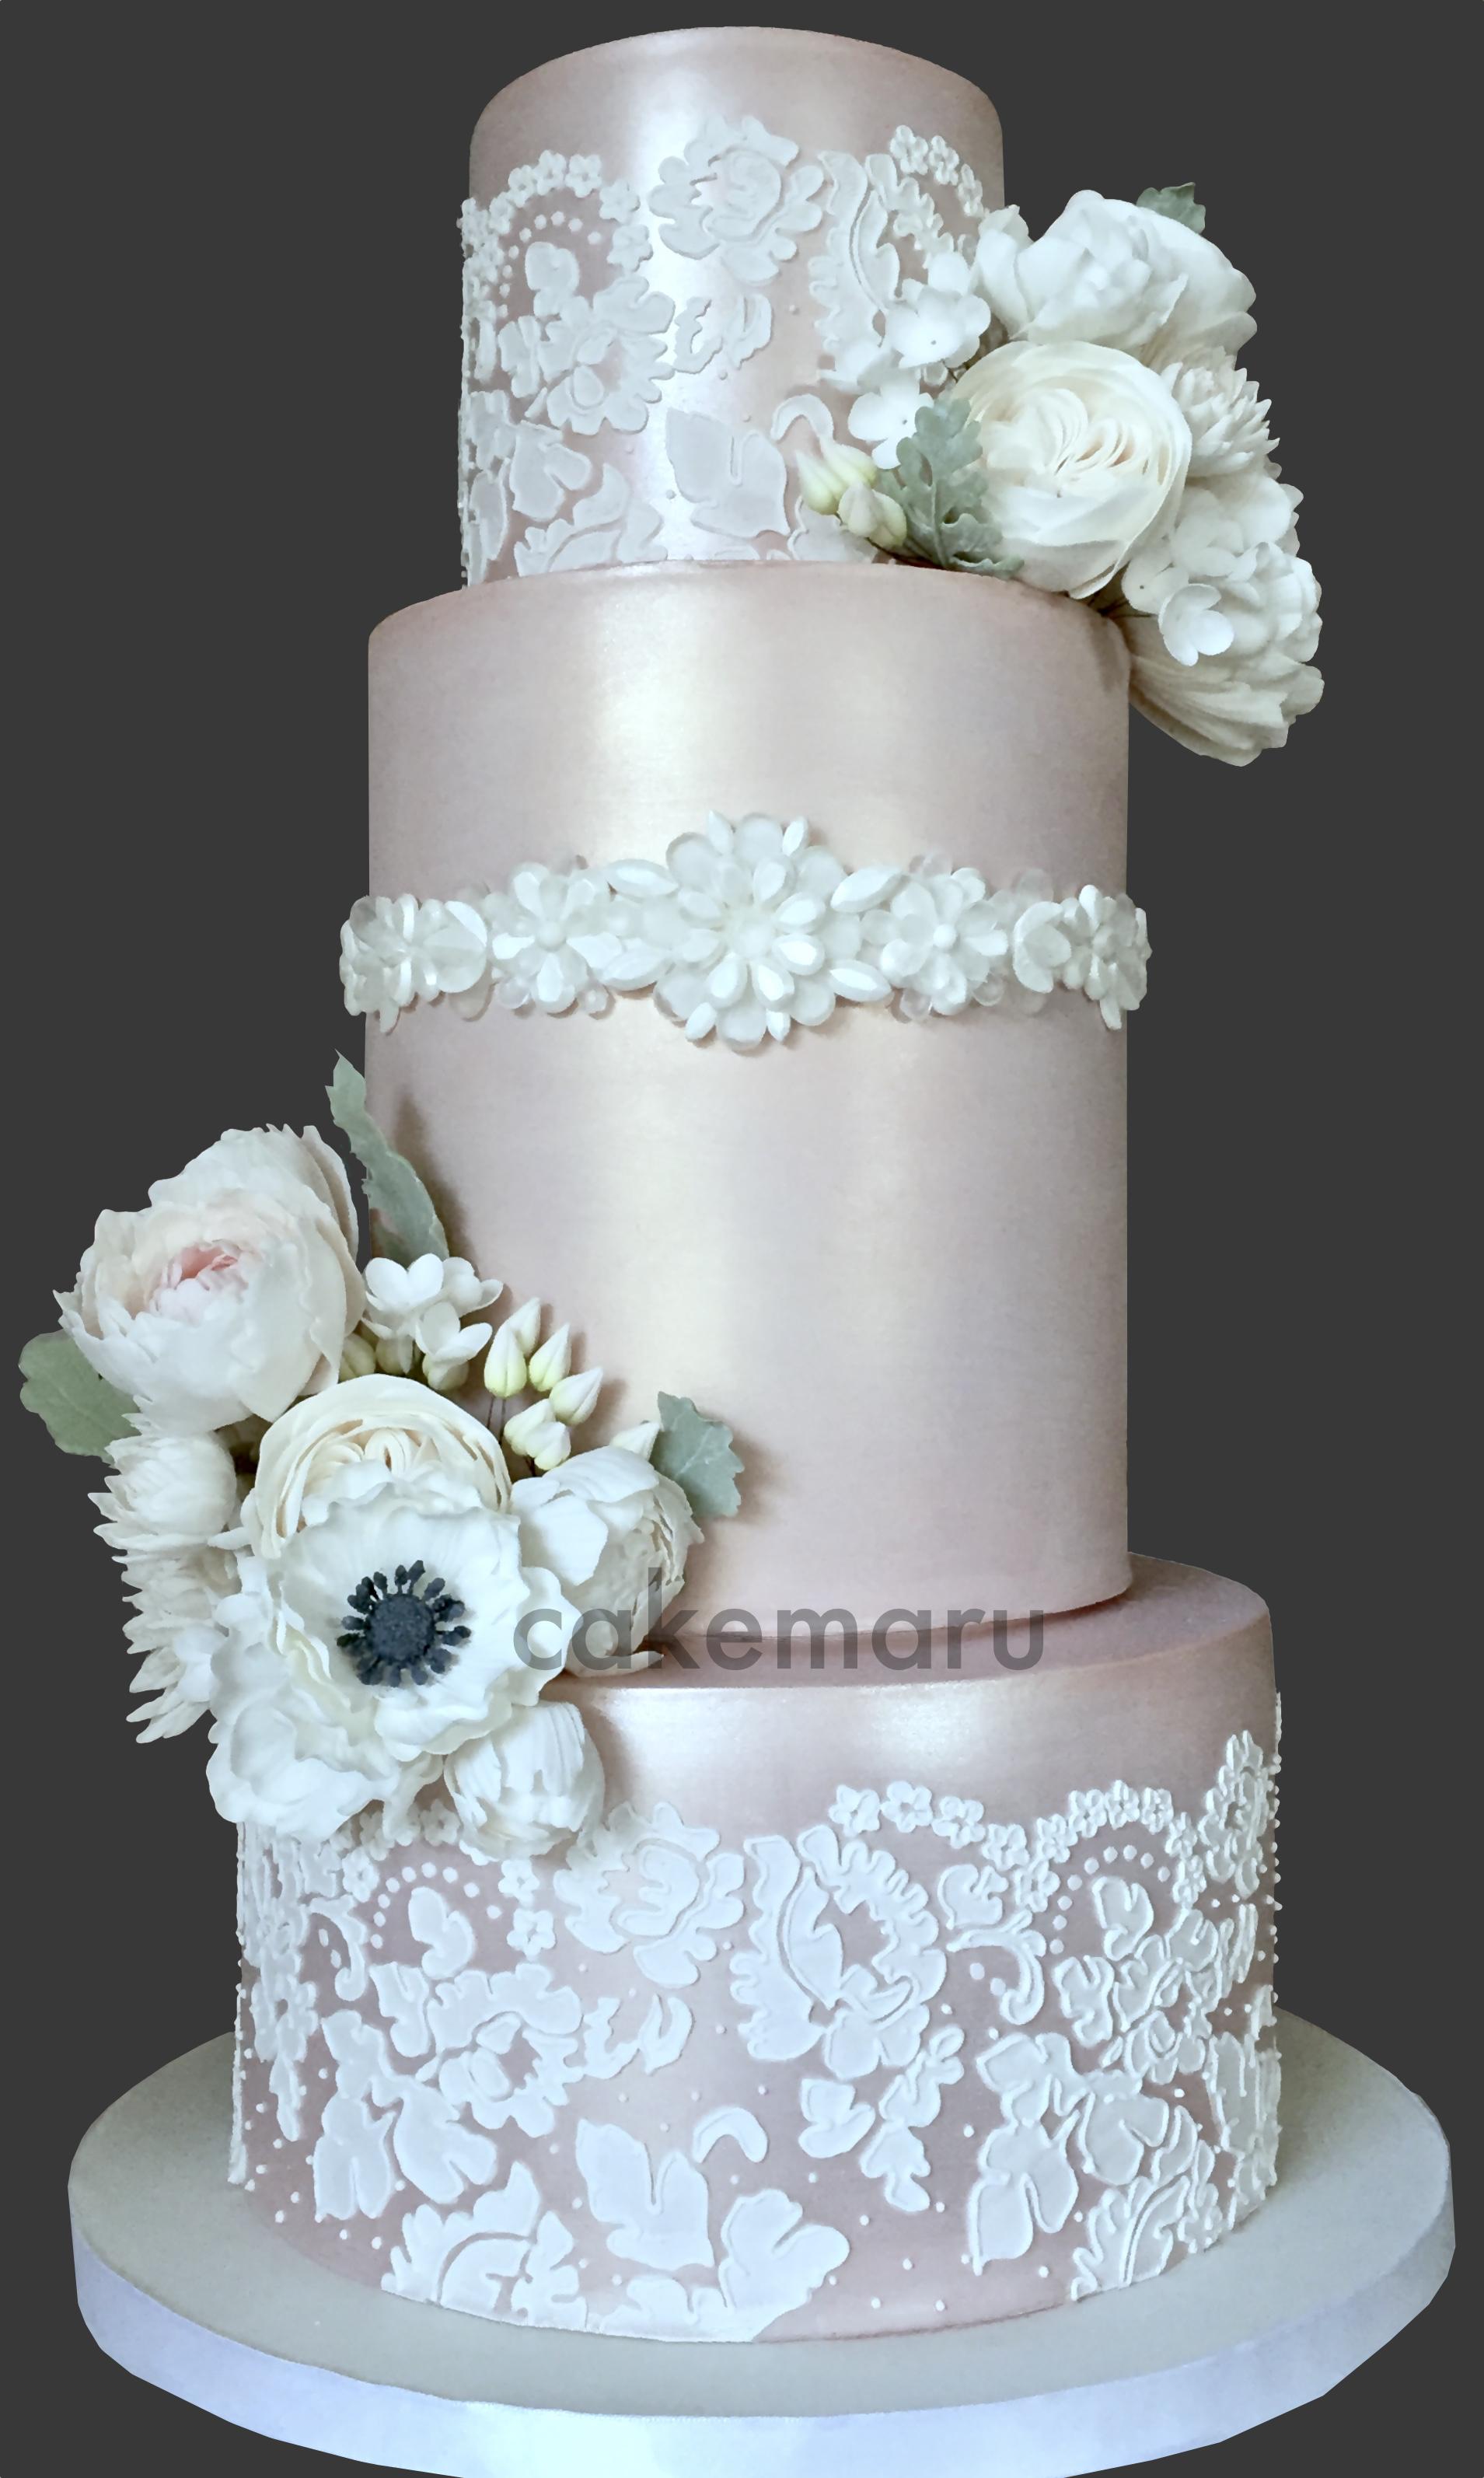 Champagne Lace Wedding Cake.jpg